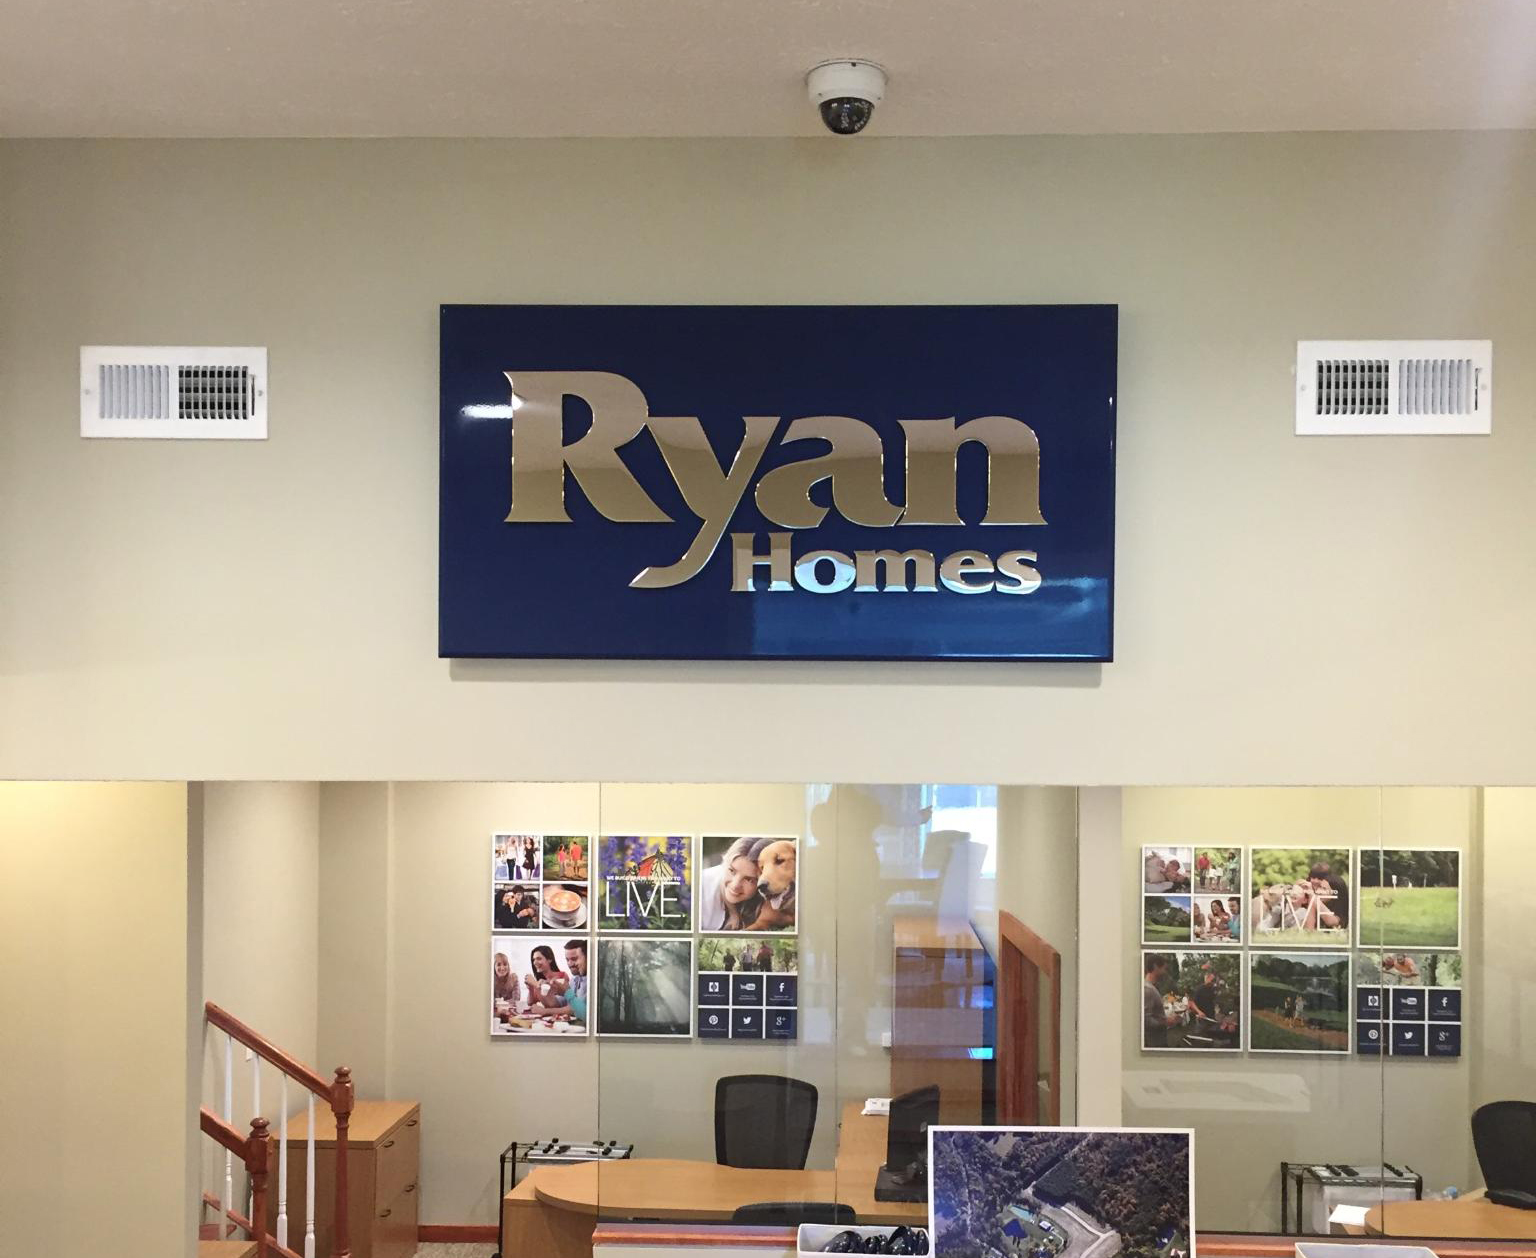 Ryan Homes branding wall sign